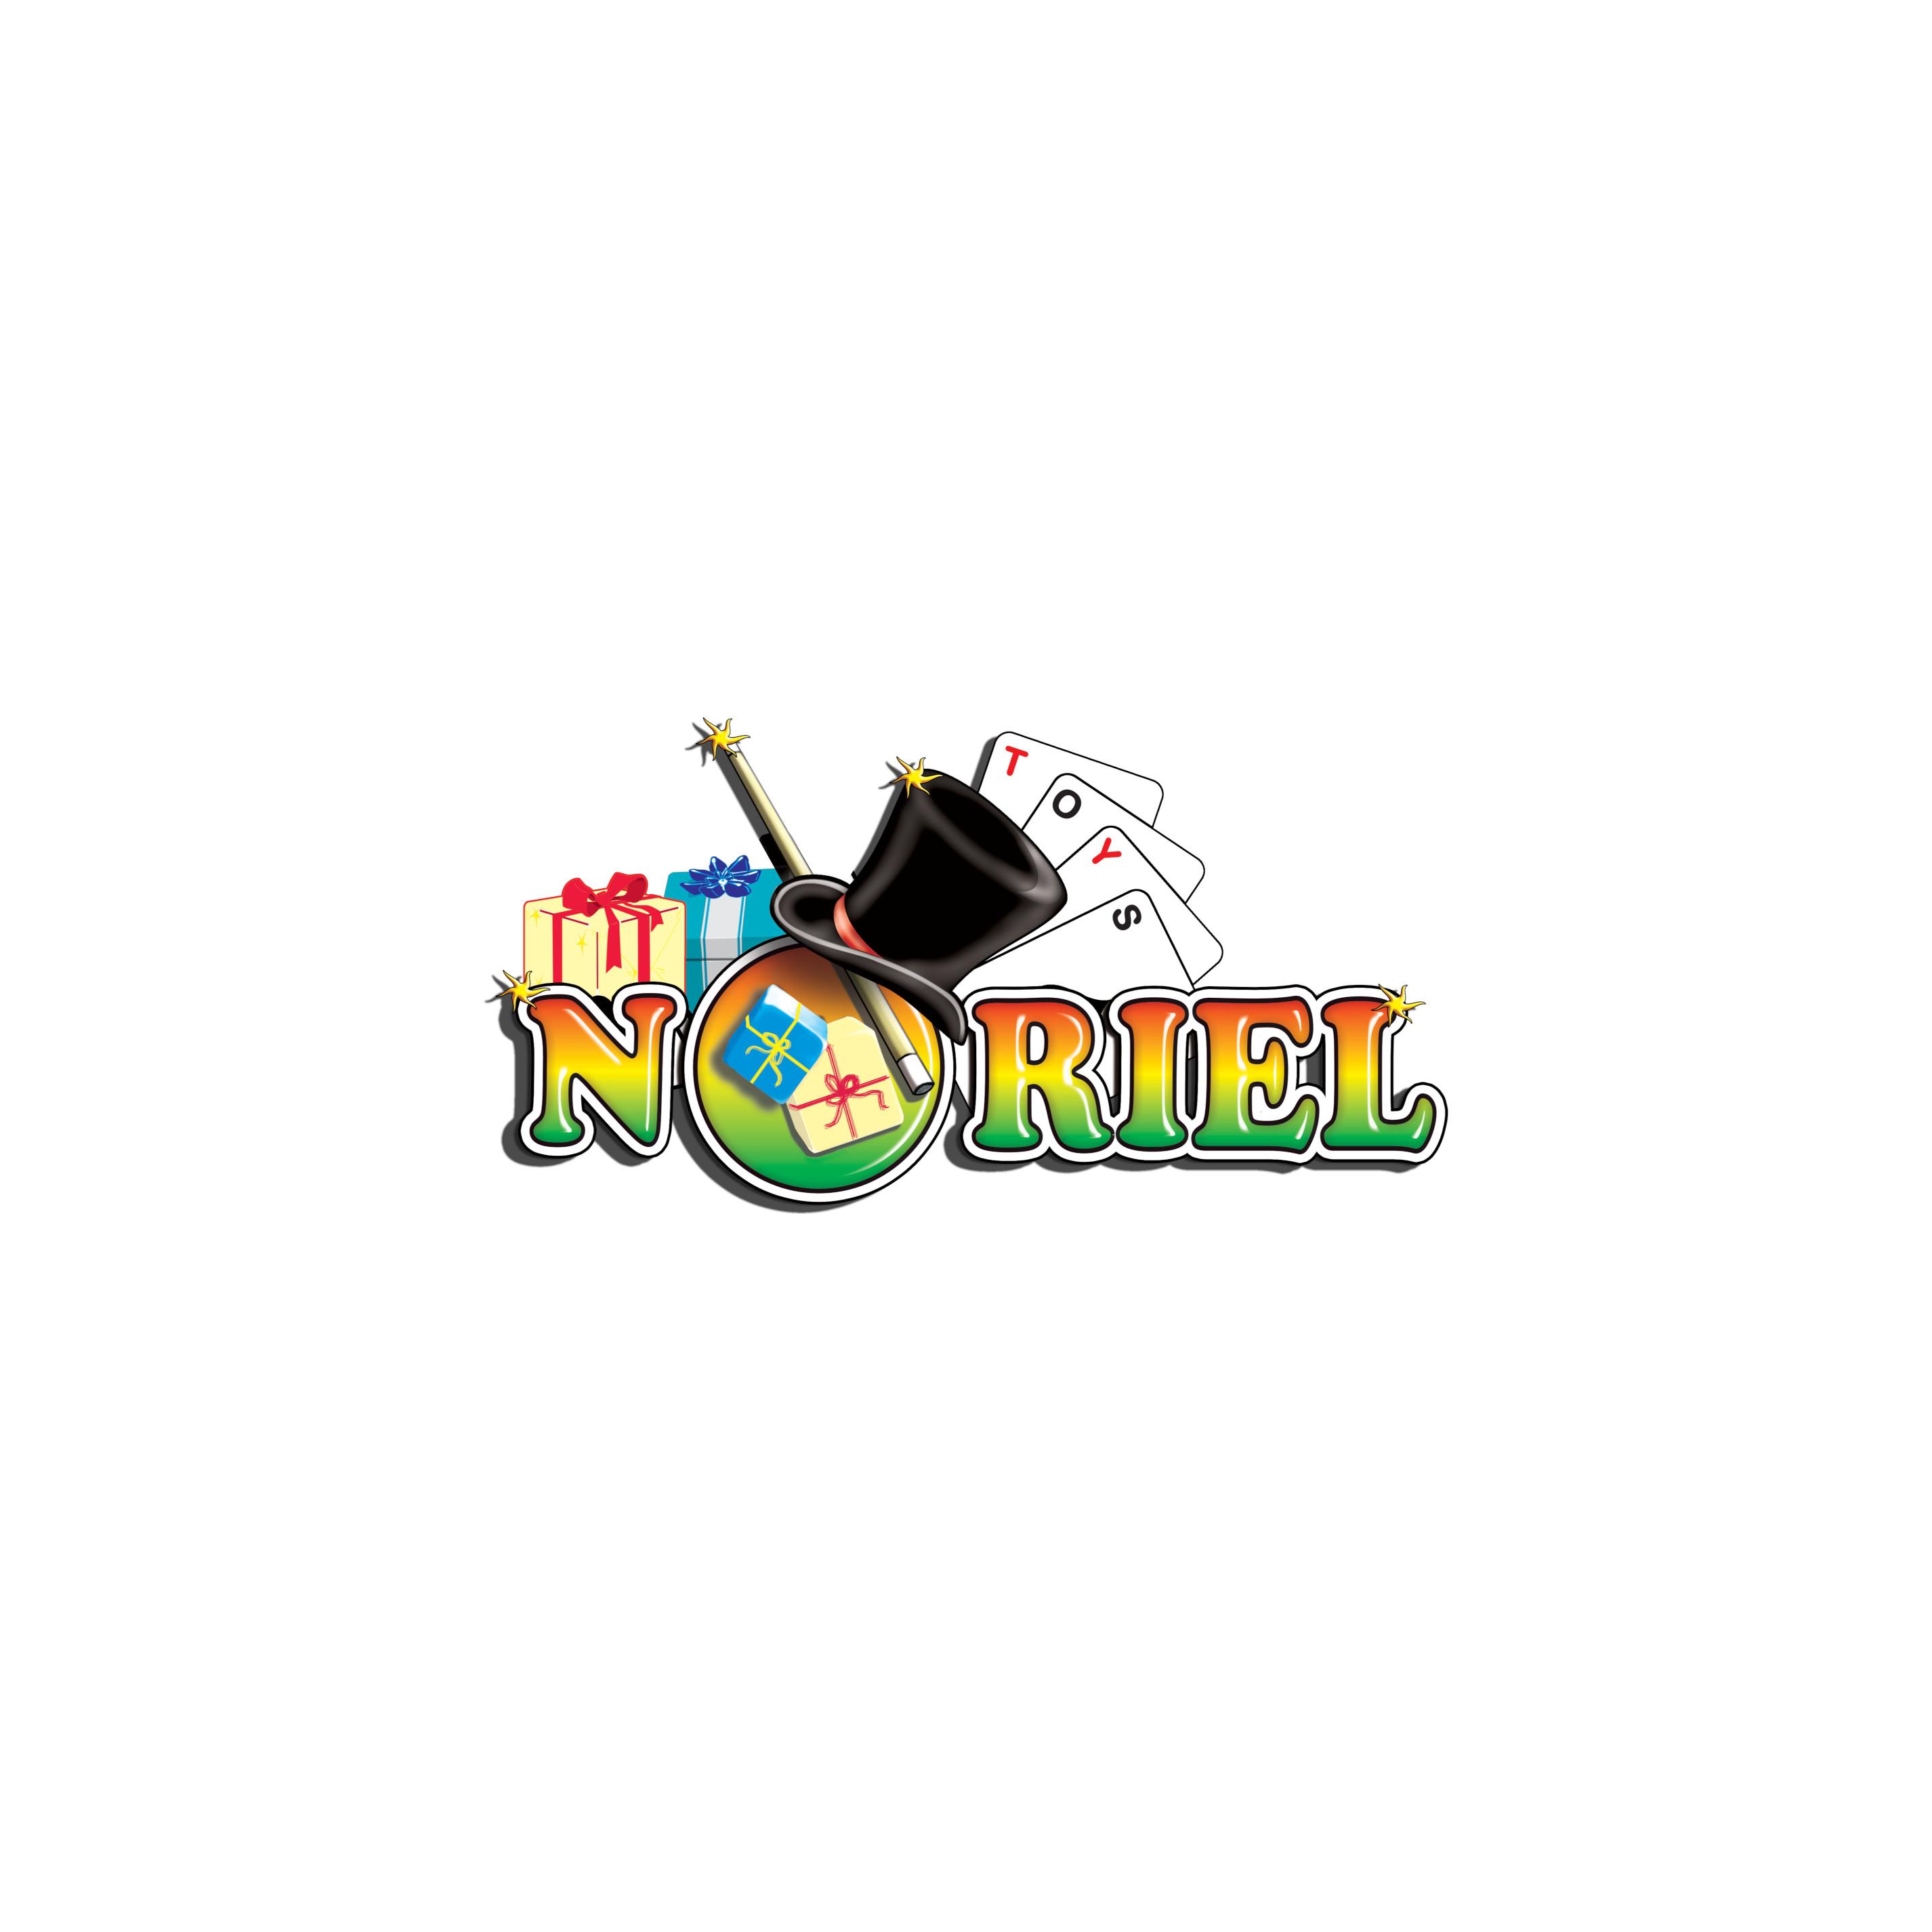 PM70042_001 Set Playmobil Dragons - Raffnut si Taffnut in costume de zbor (70042)